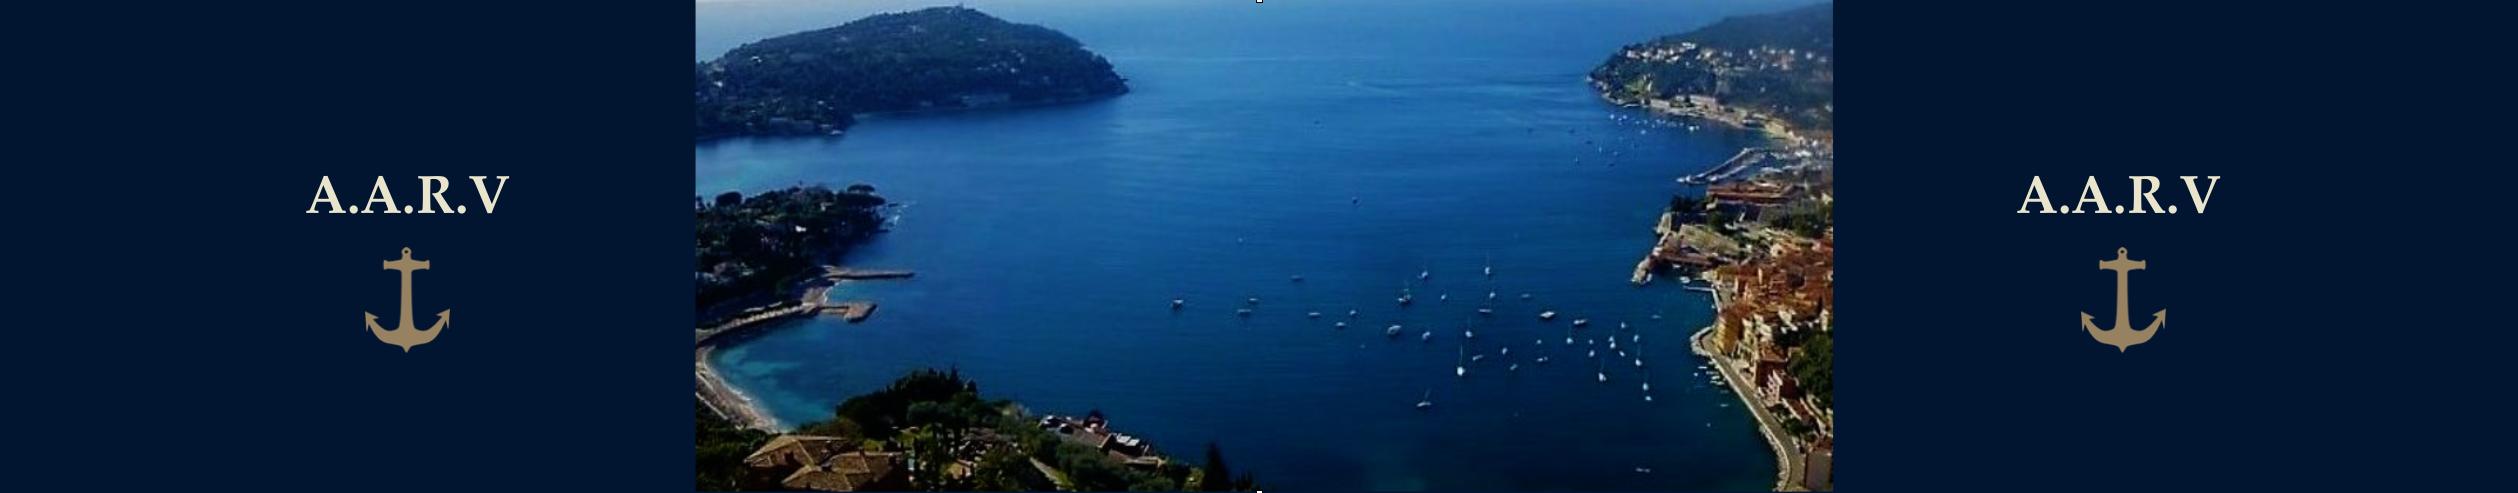 AARV - Association Les Amis de la Rade de Villefranche sur mer